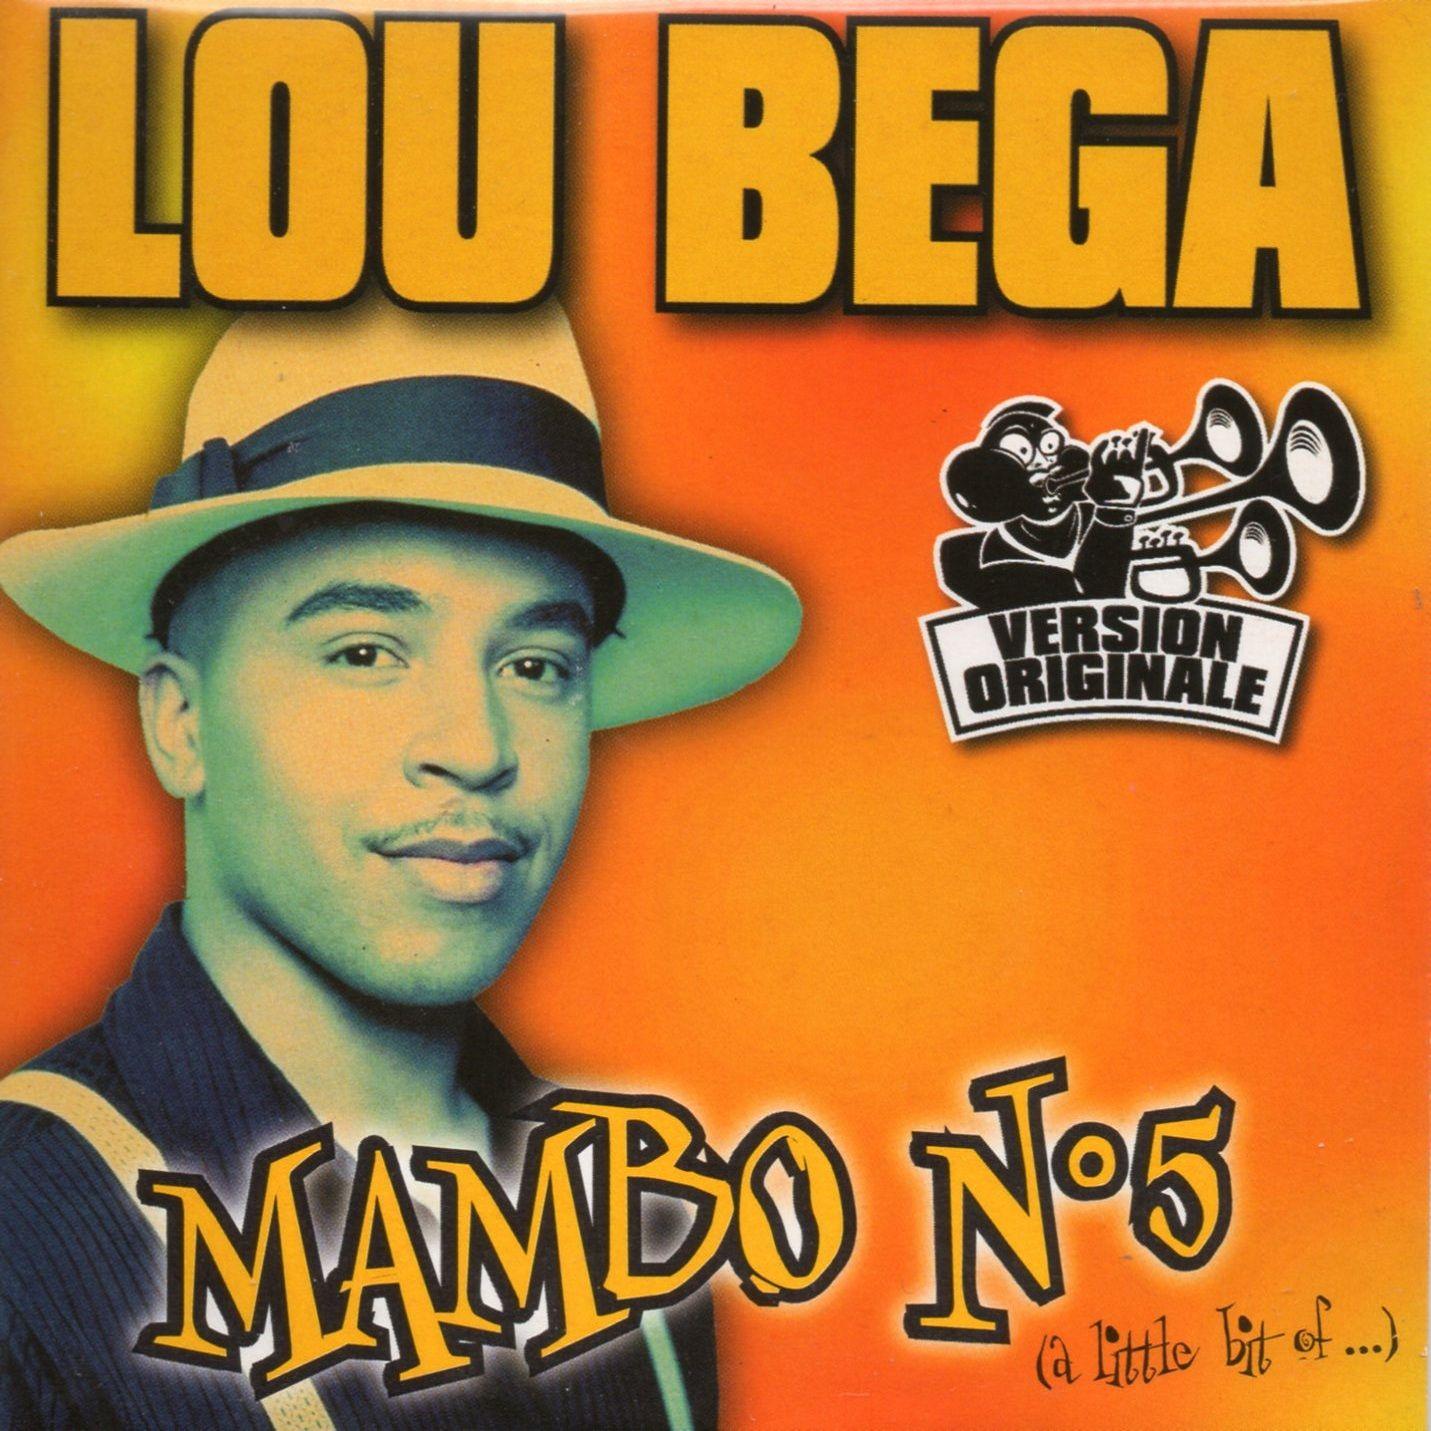 Lou Bega – Mambo No. 5 (A Little Bit of…) (single cover art)